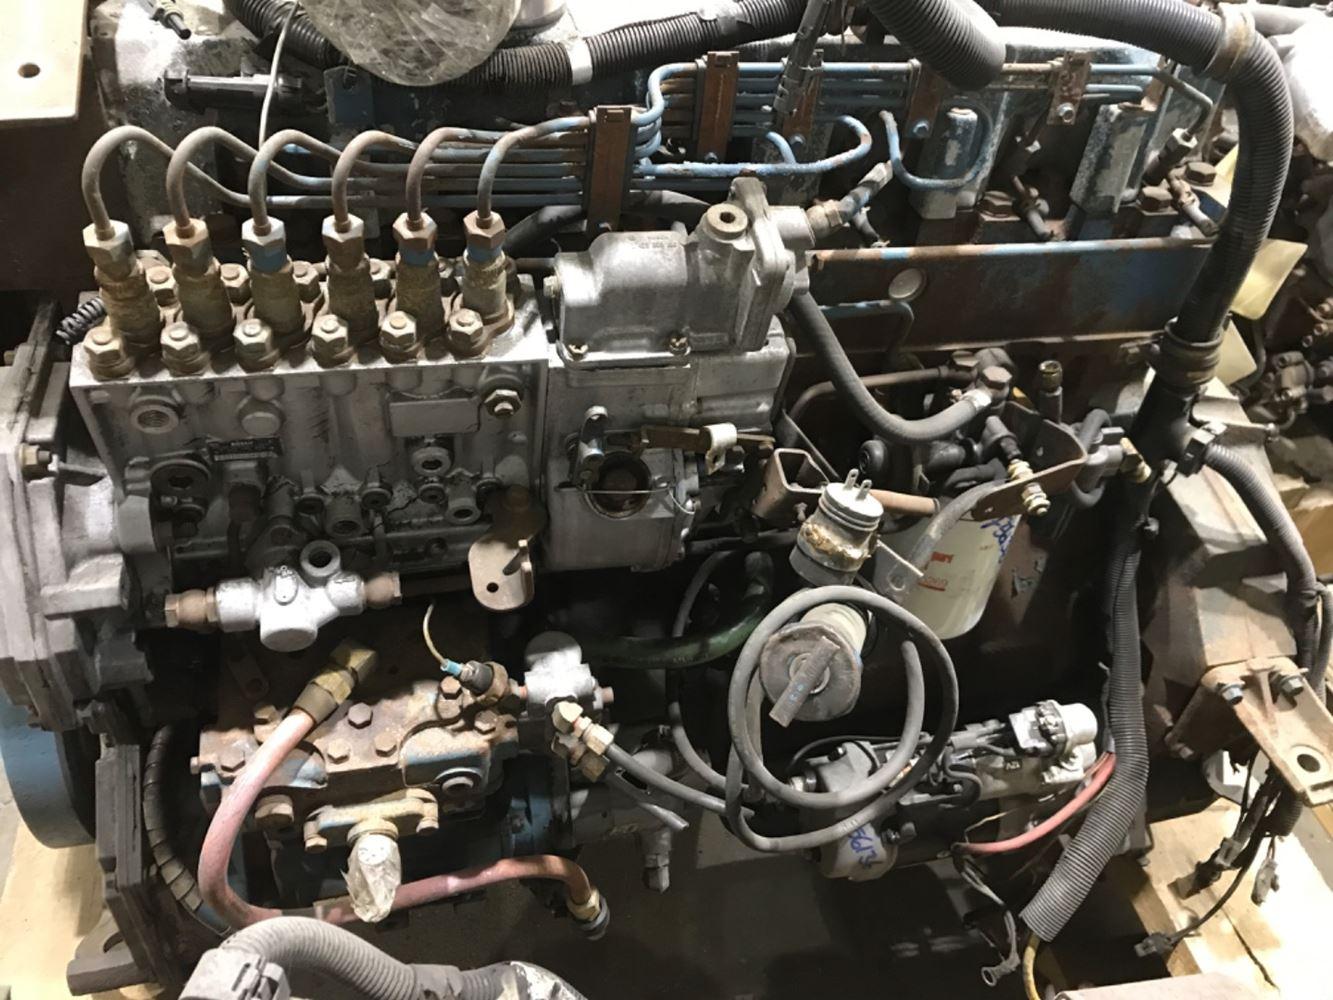 1994 INTERNATIONAL DT466 ENGINE ASSEMBLY TRUCK PARTS #679996